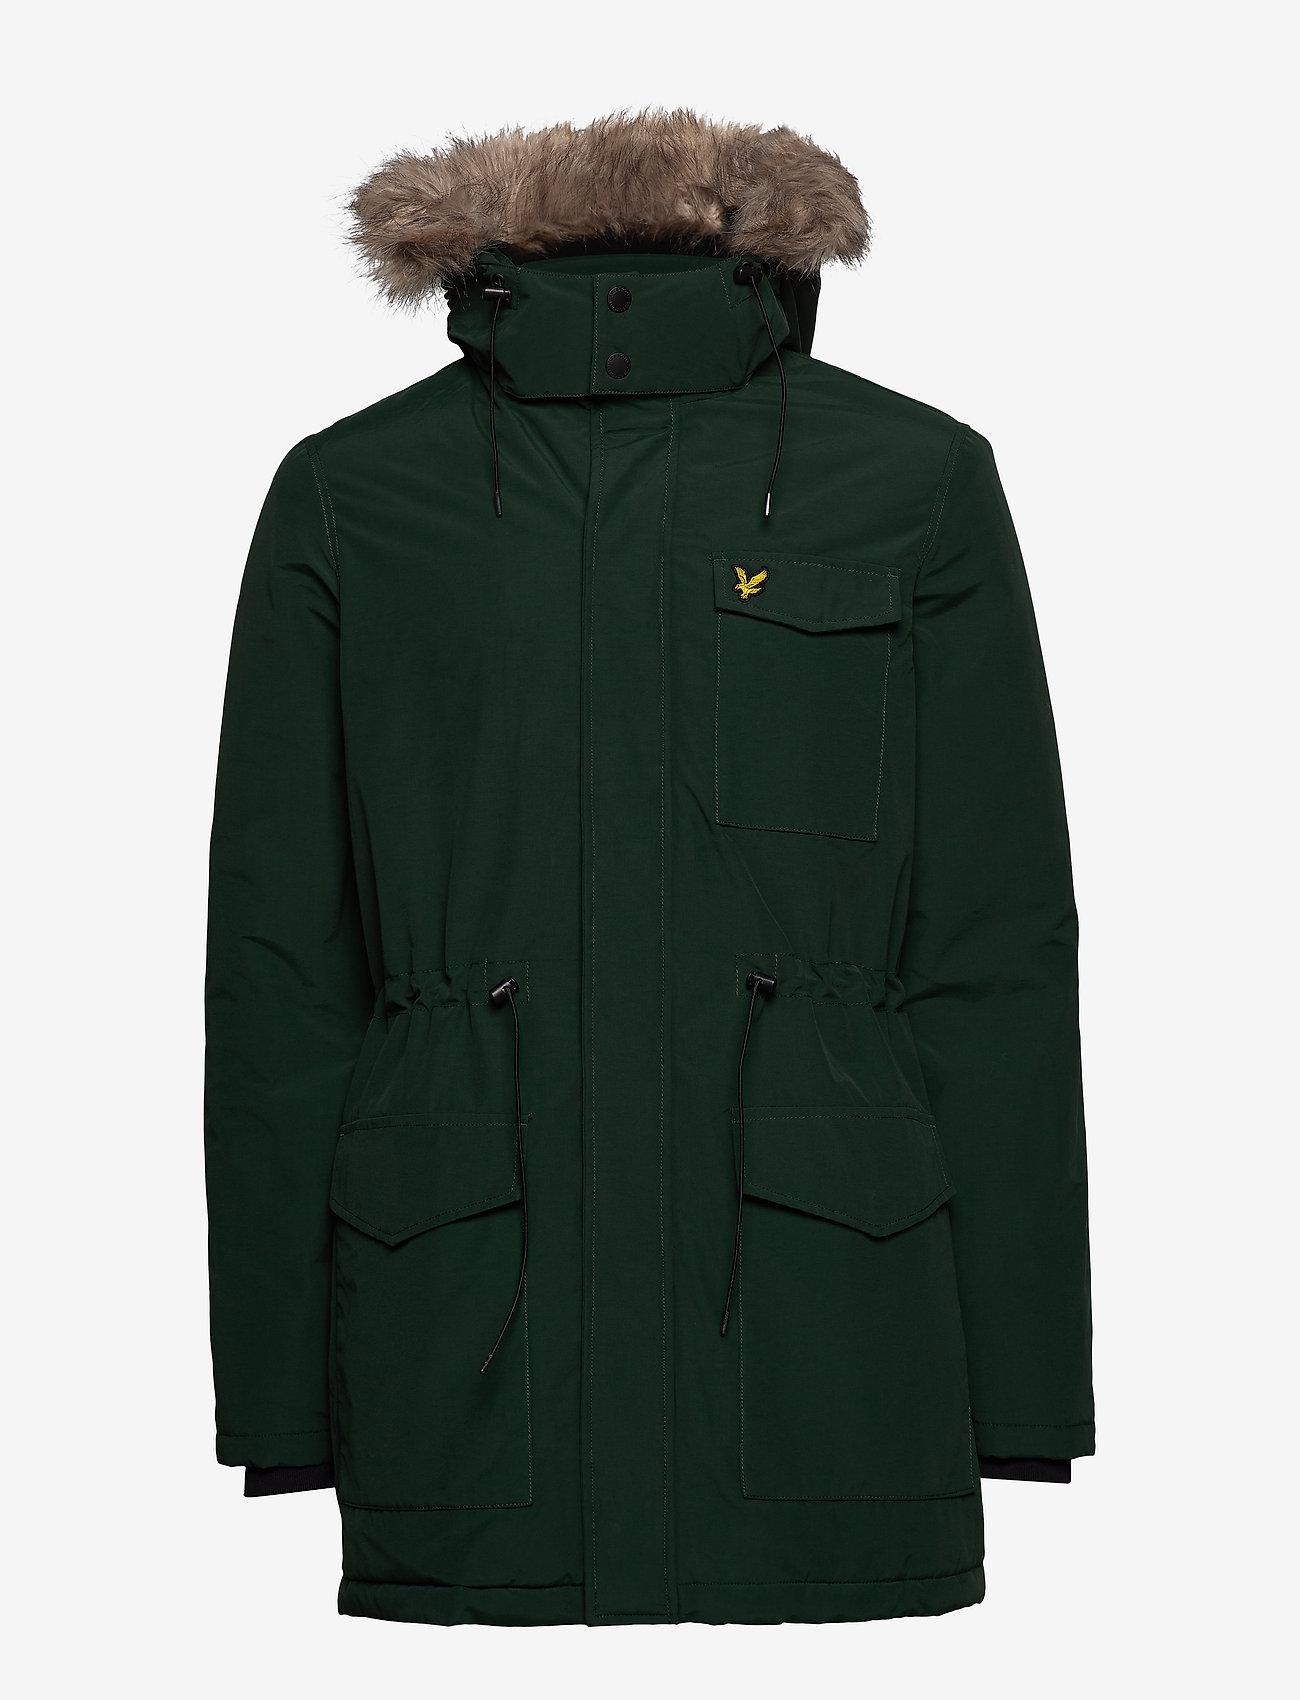 Lyle & Scott Winter Weight Microfleece Jacket - Jakker og frakker JADE GREEN - Menn Klær